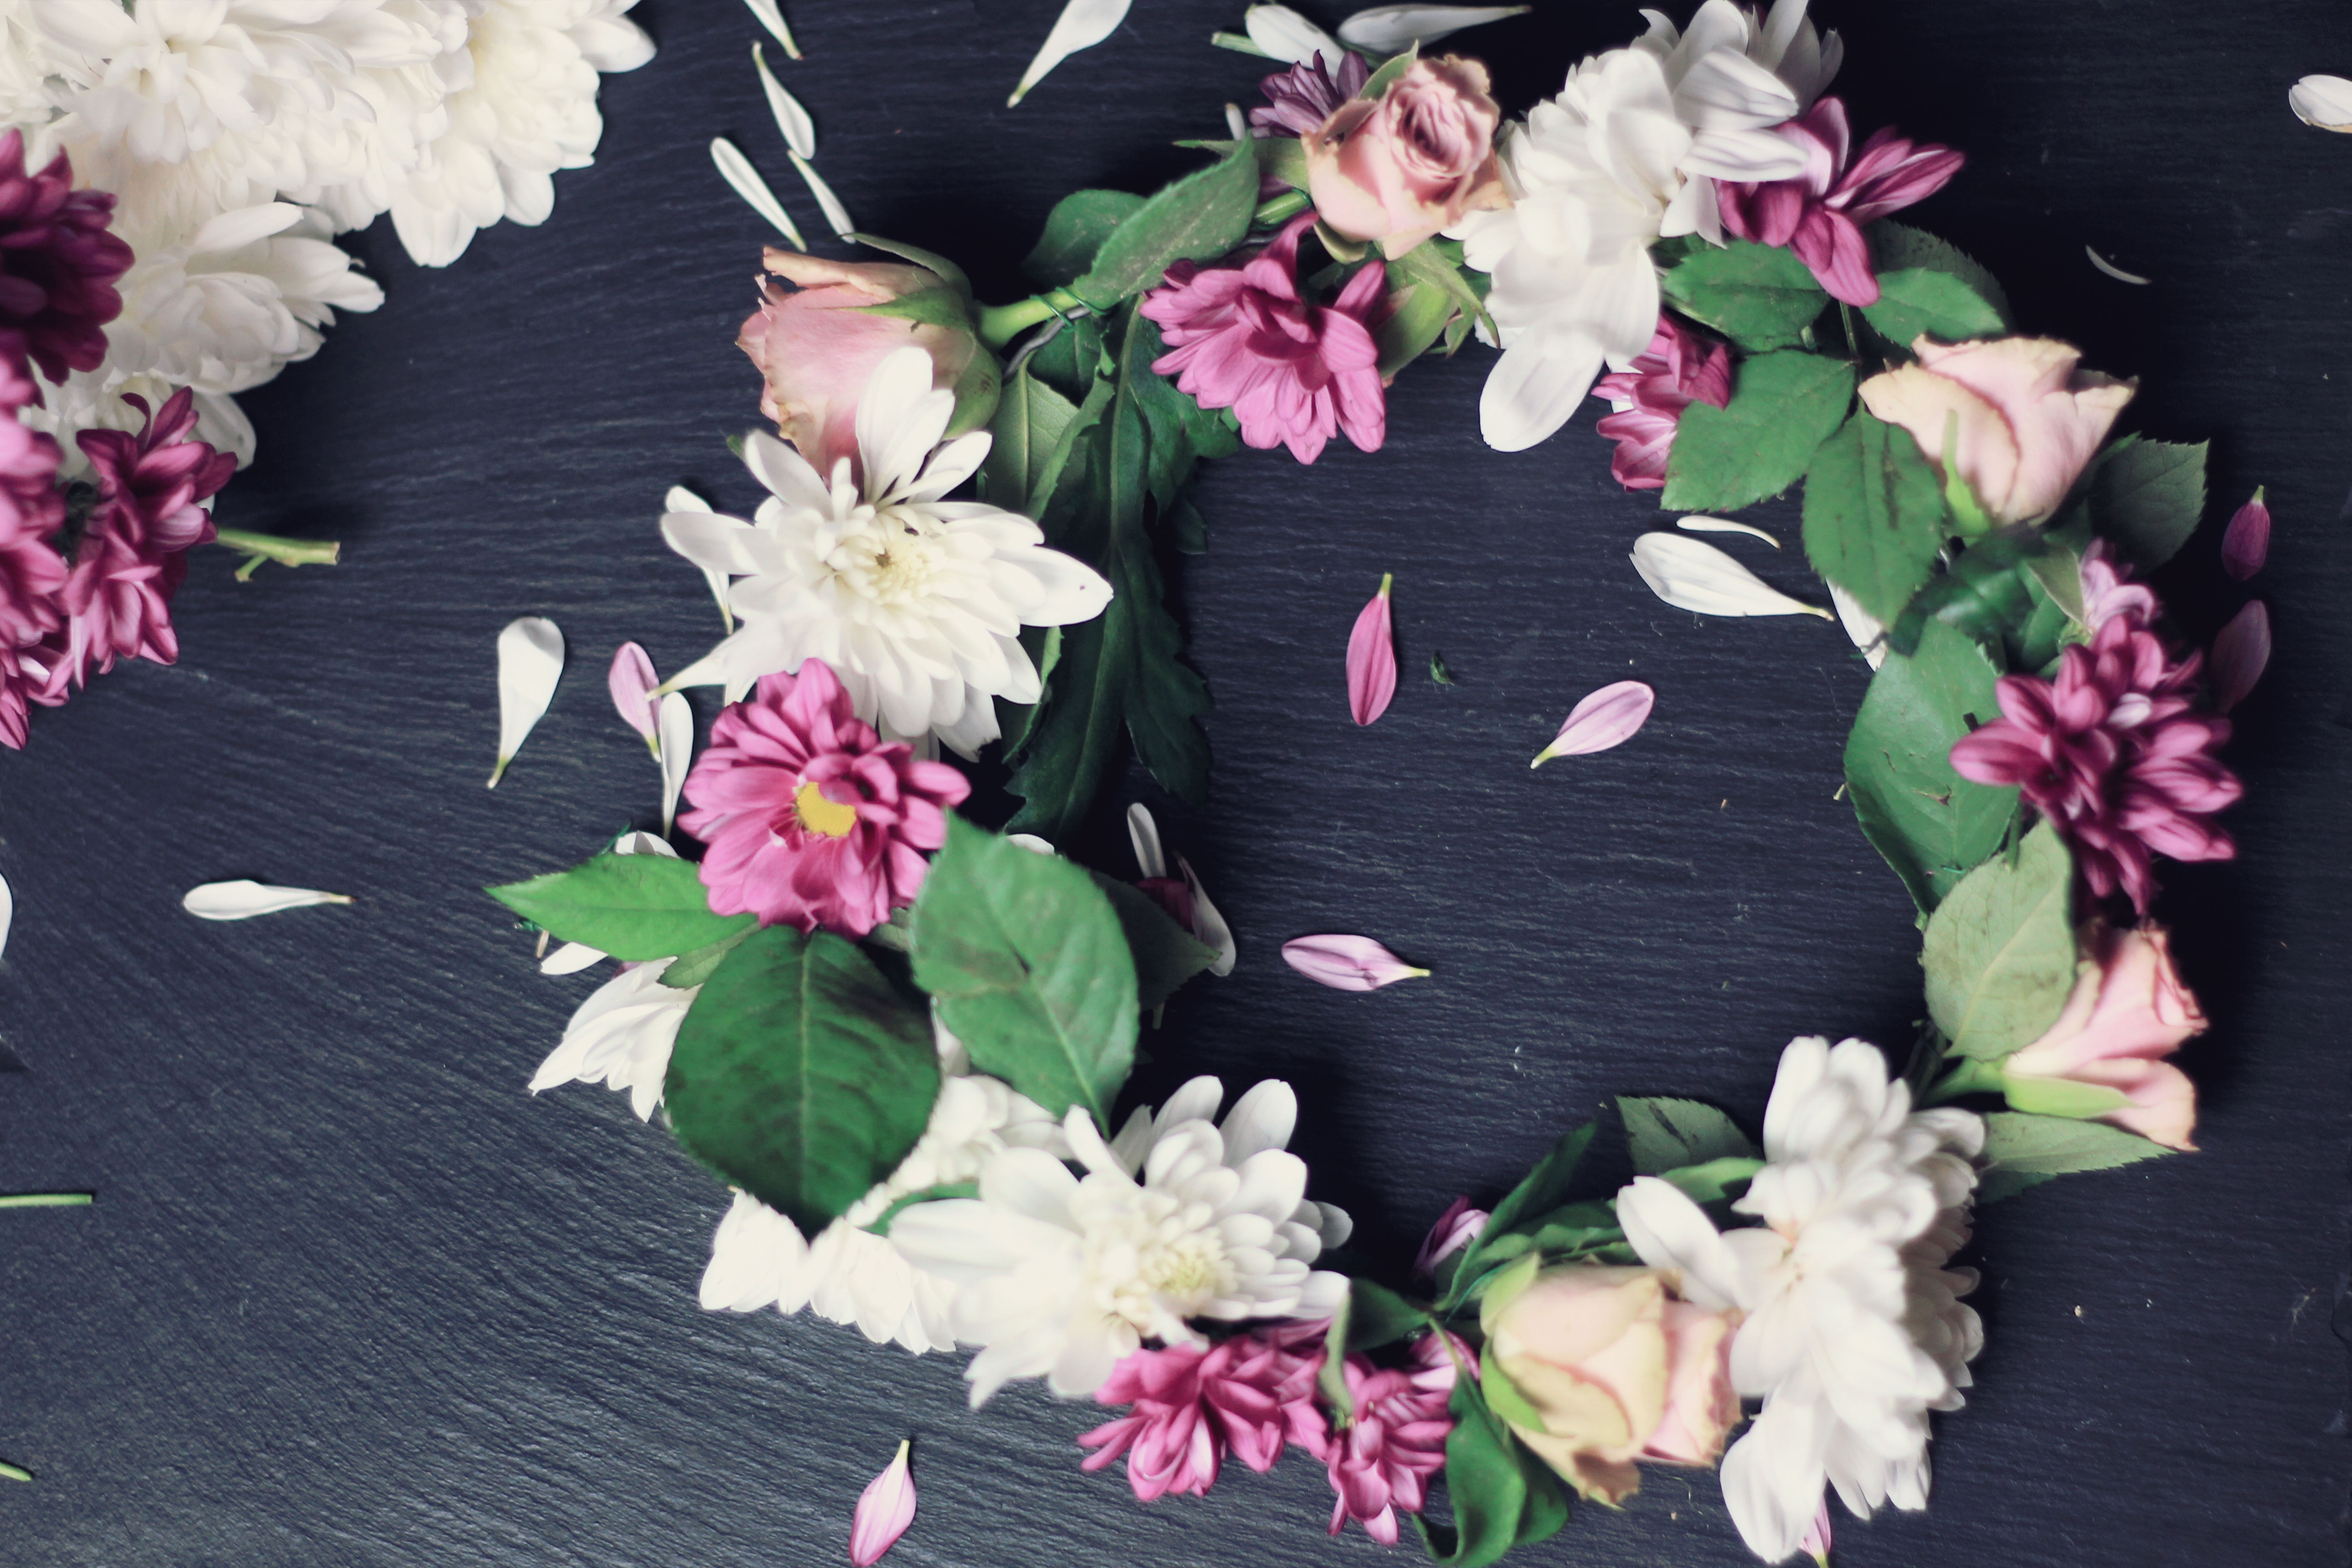 diy blumenkrone, blumenkranz, flowercrown, hochzeit, boho, bohemian, wedding, modeblog, pinterest